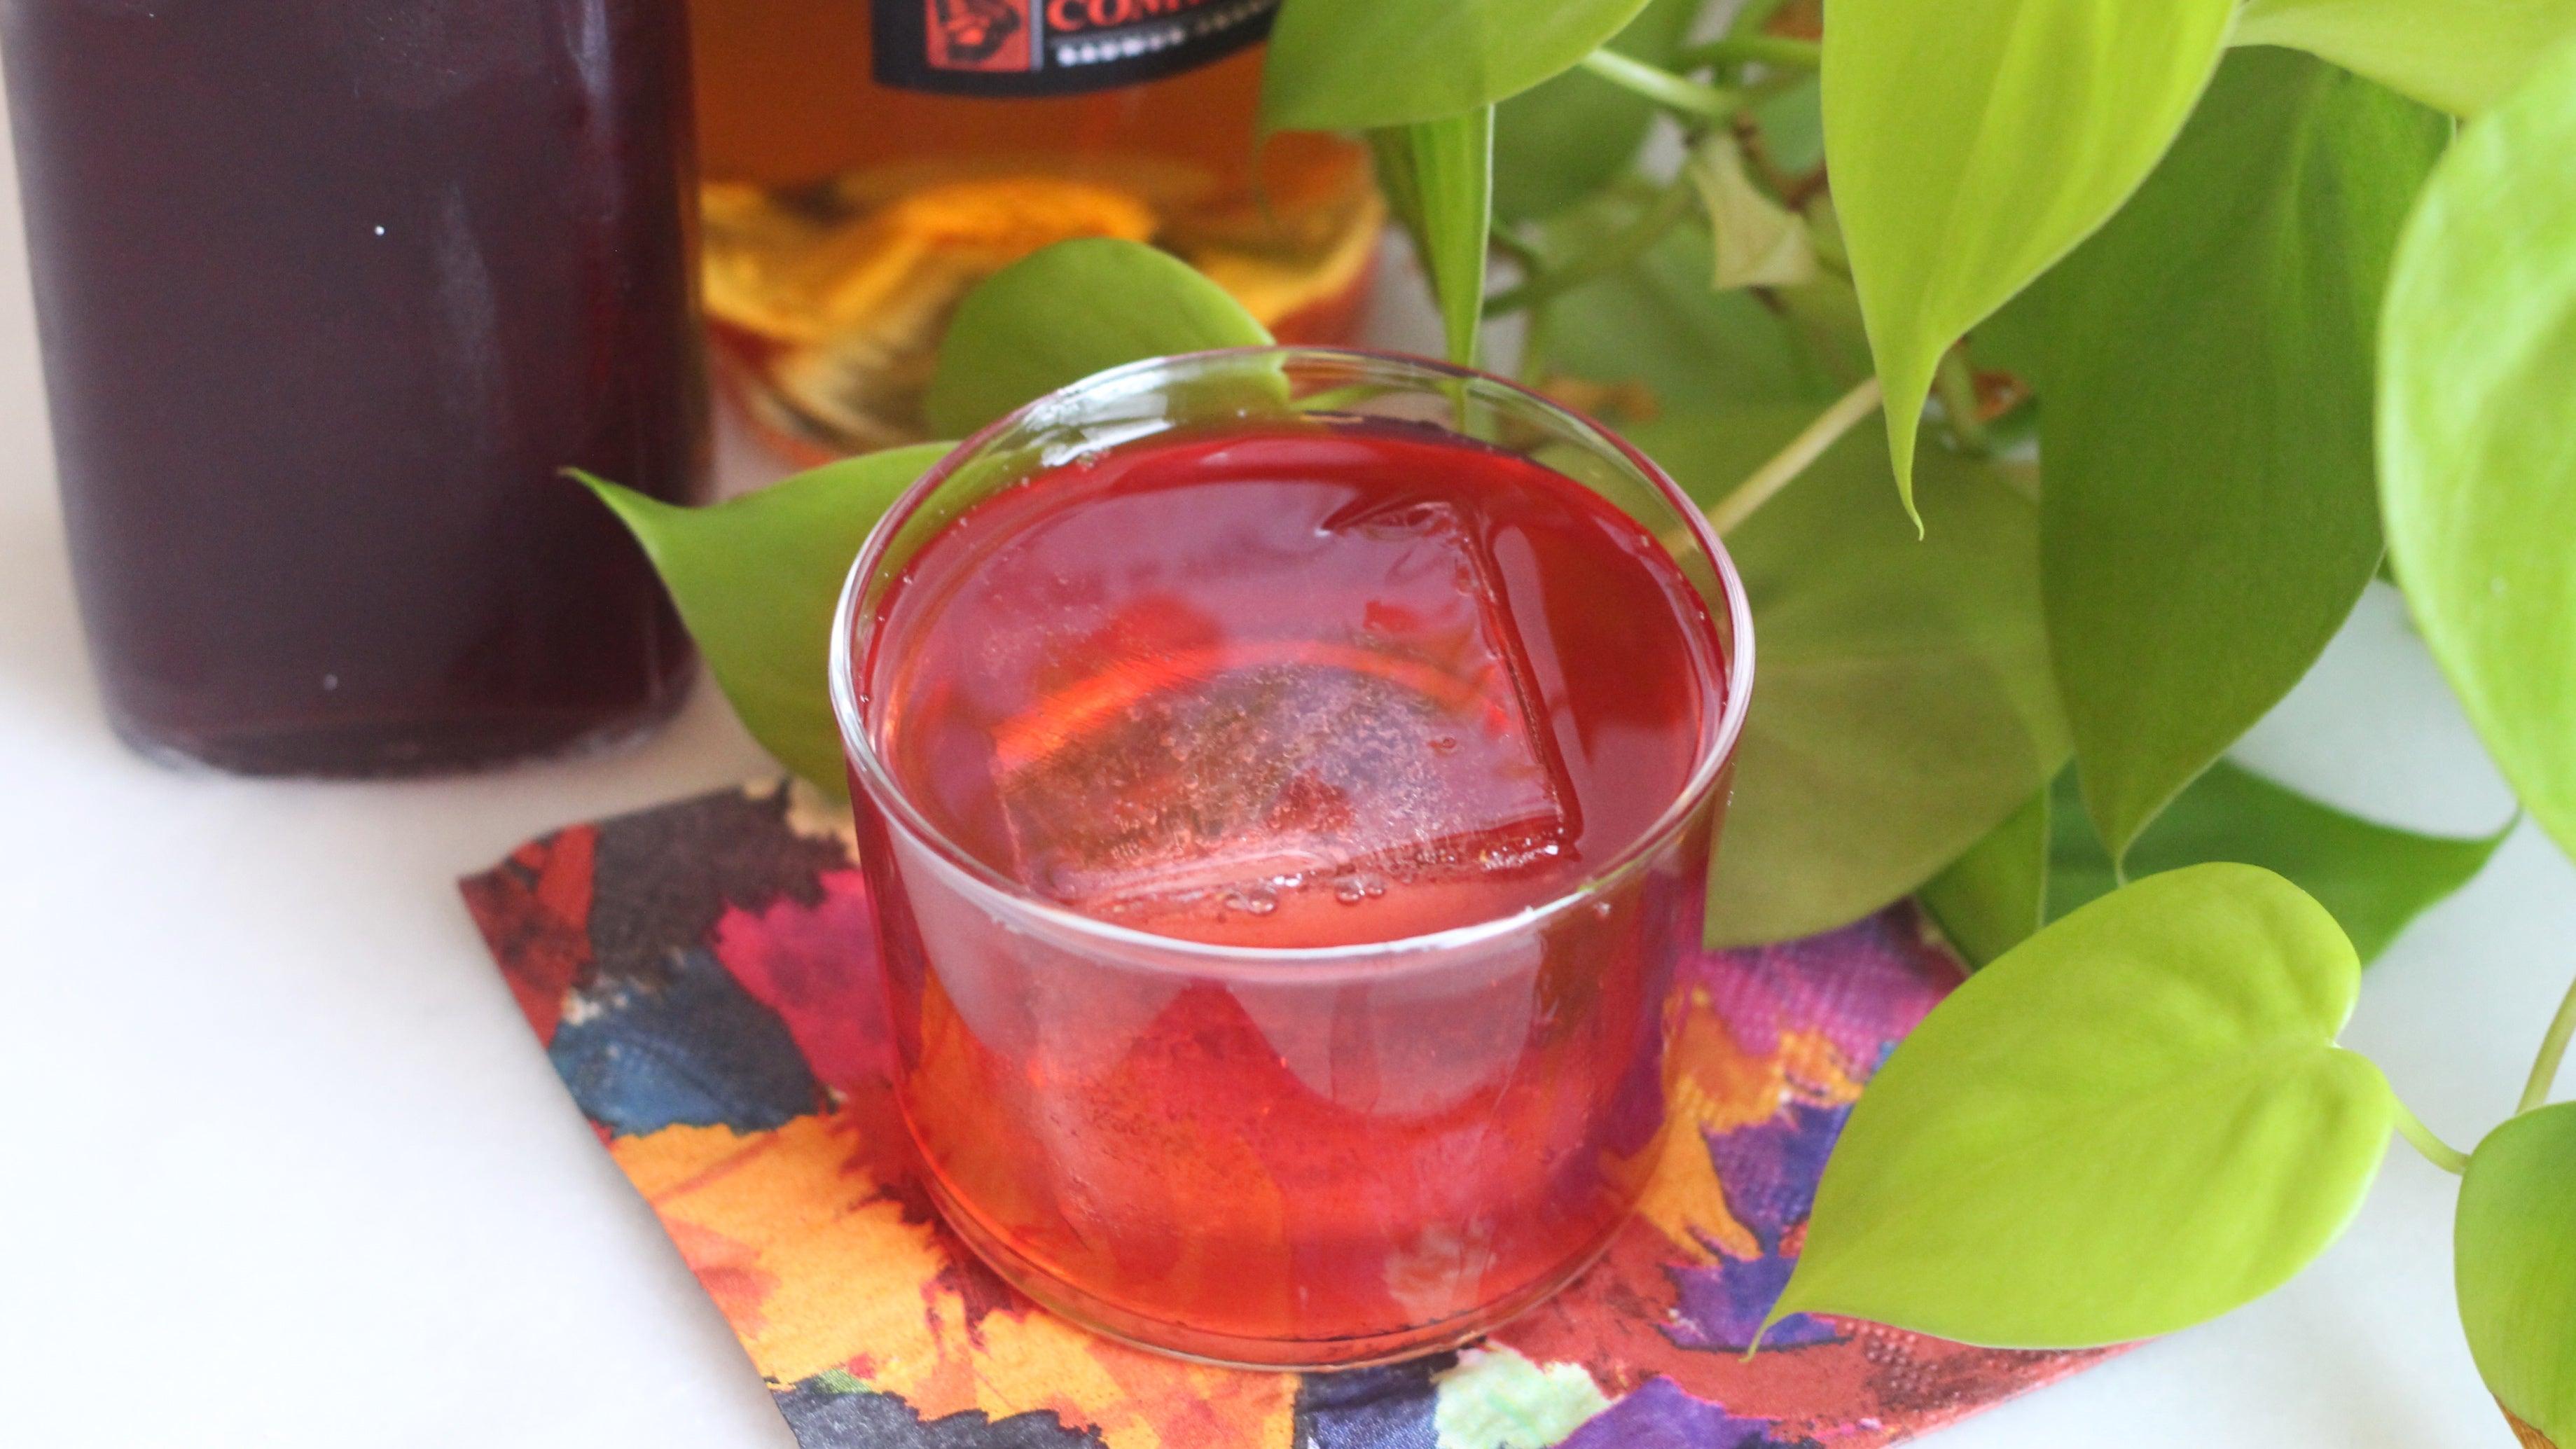 Peach Liqueur Was Made For Shrubs